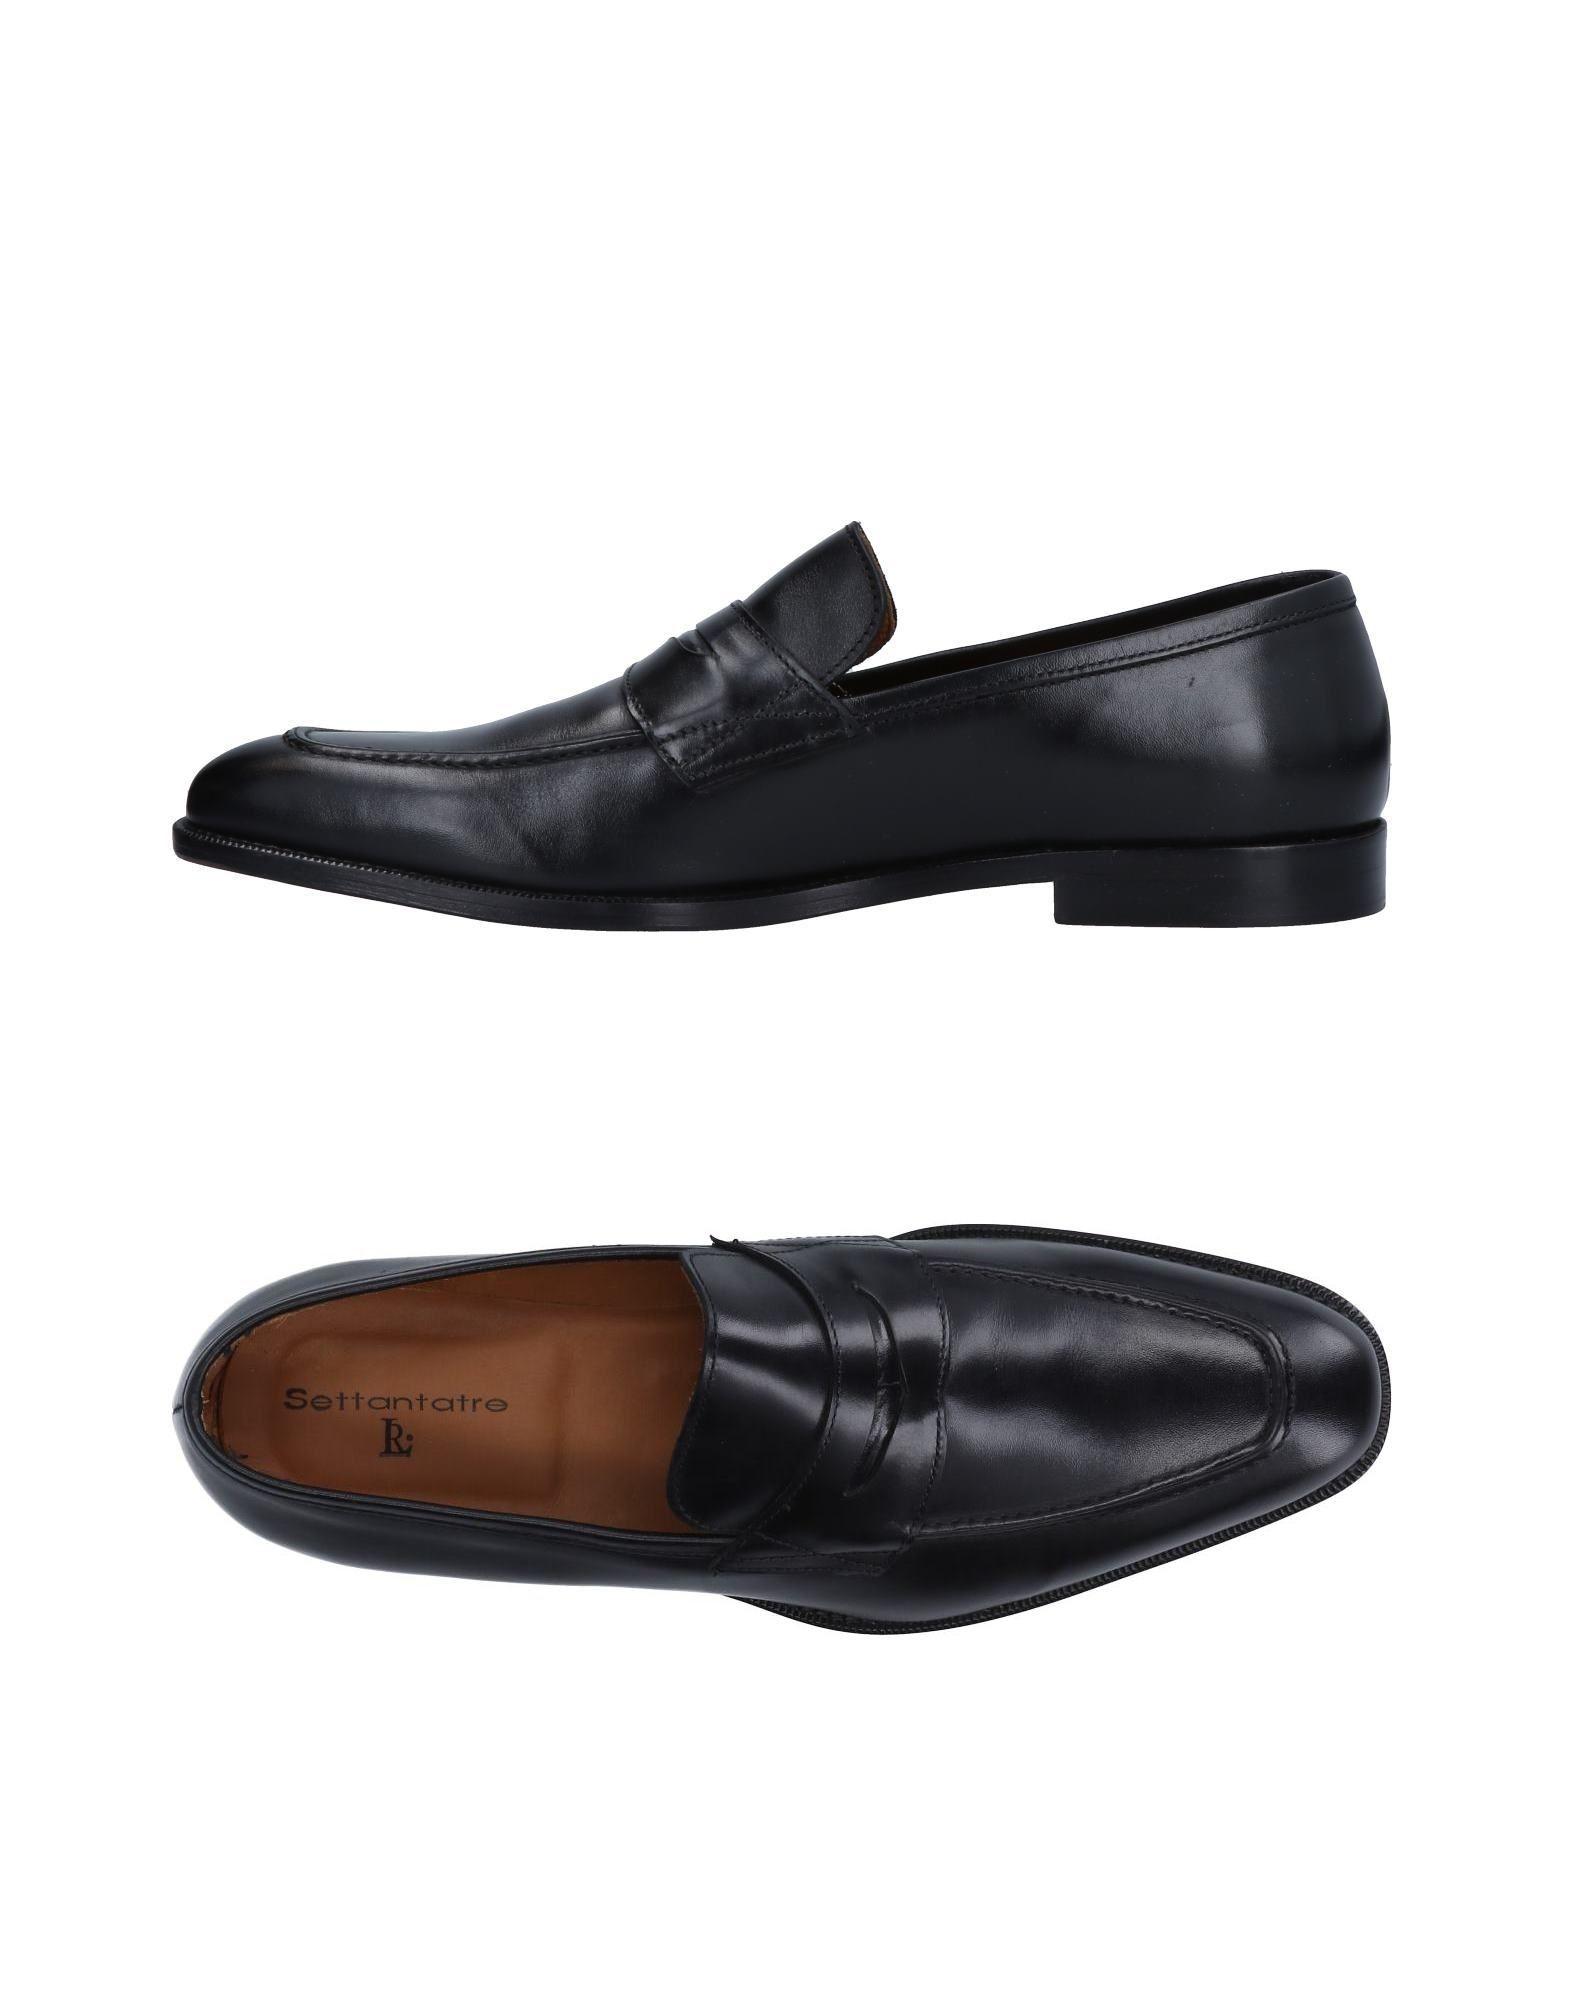 SETTANTATRE LR | SETTANTATRE LR Loafers 11512518 | Goxip